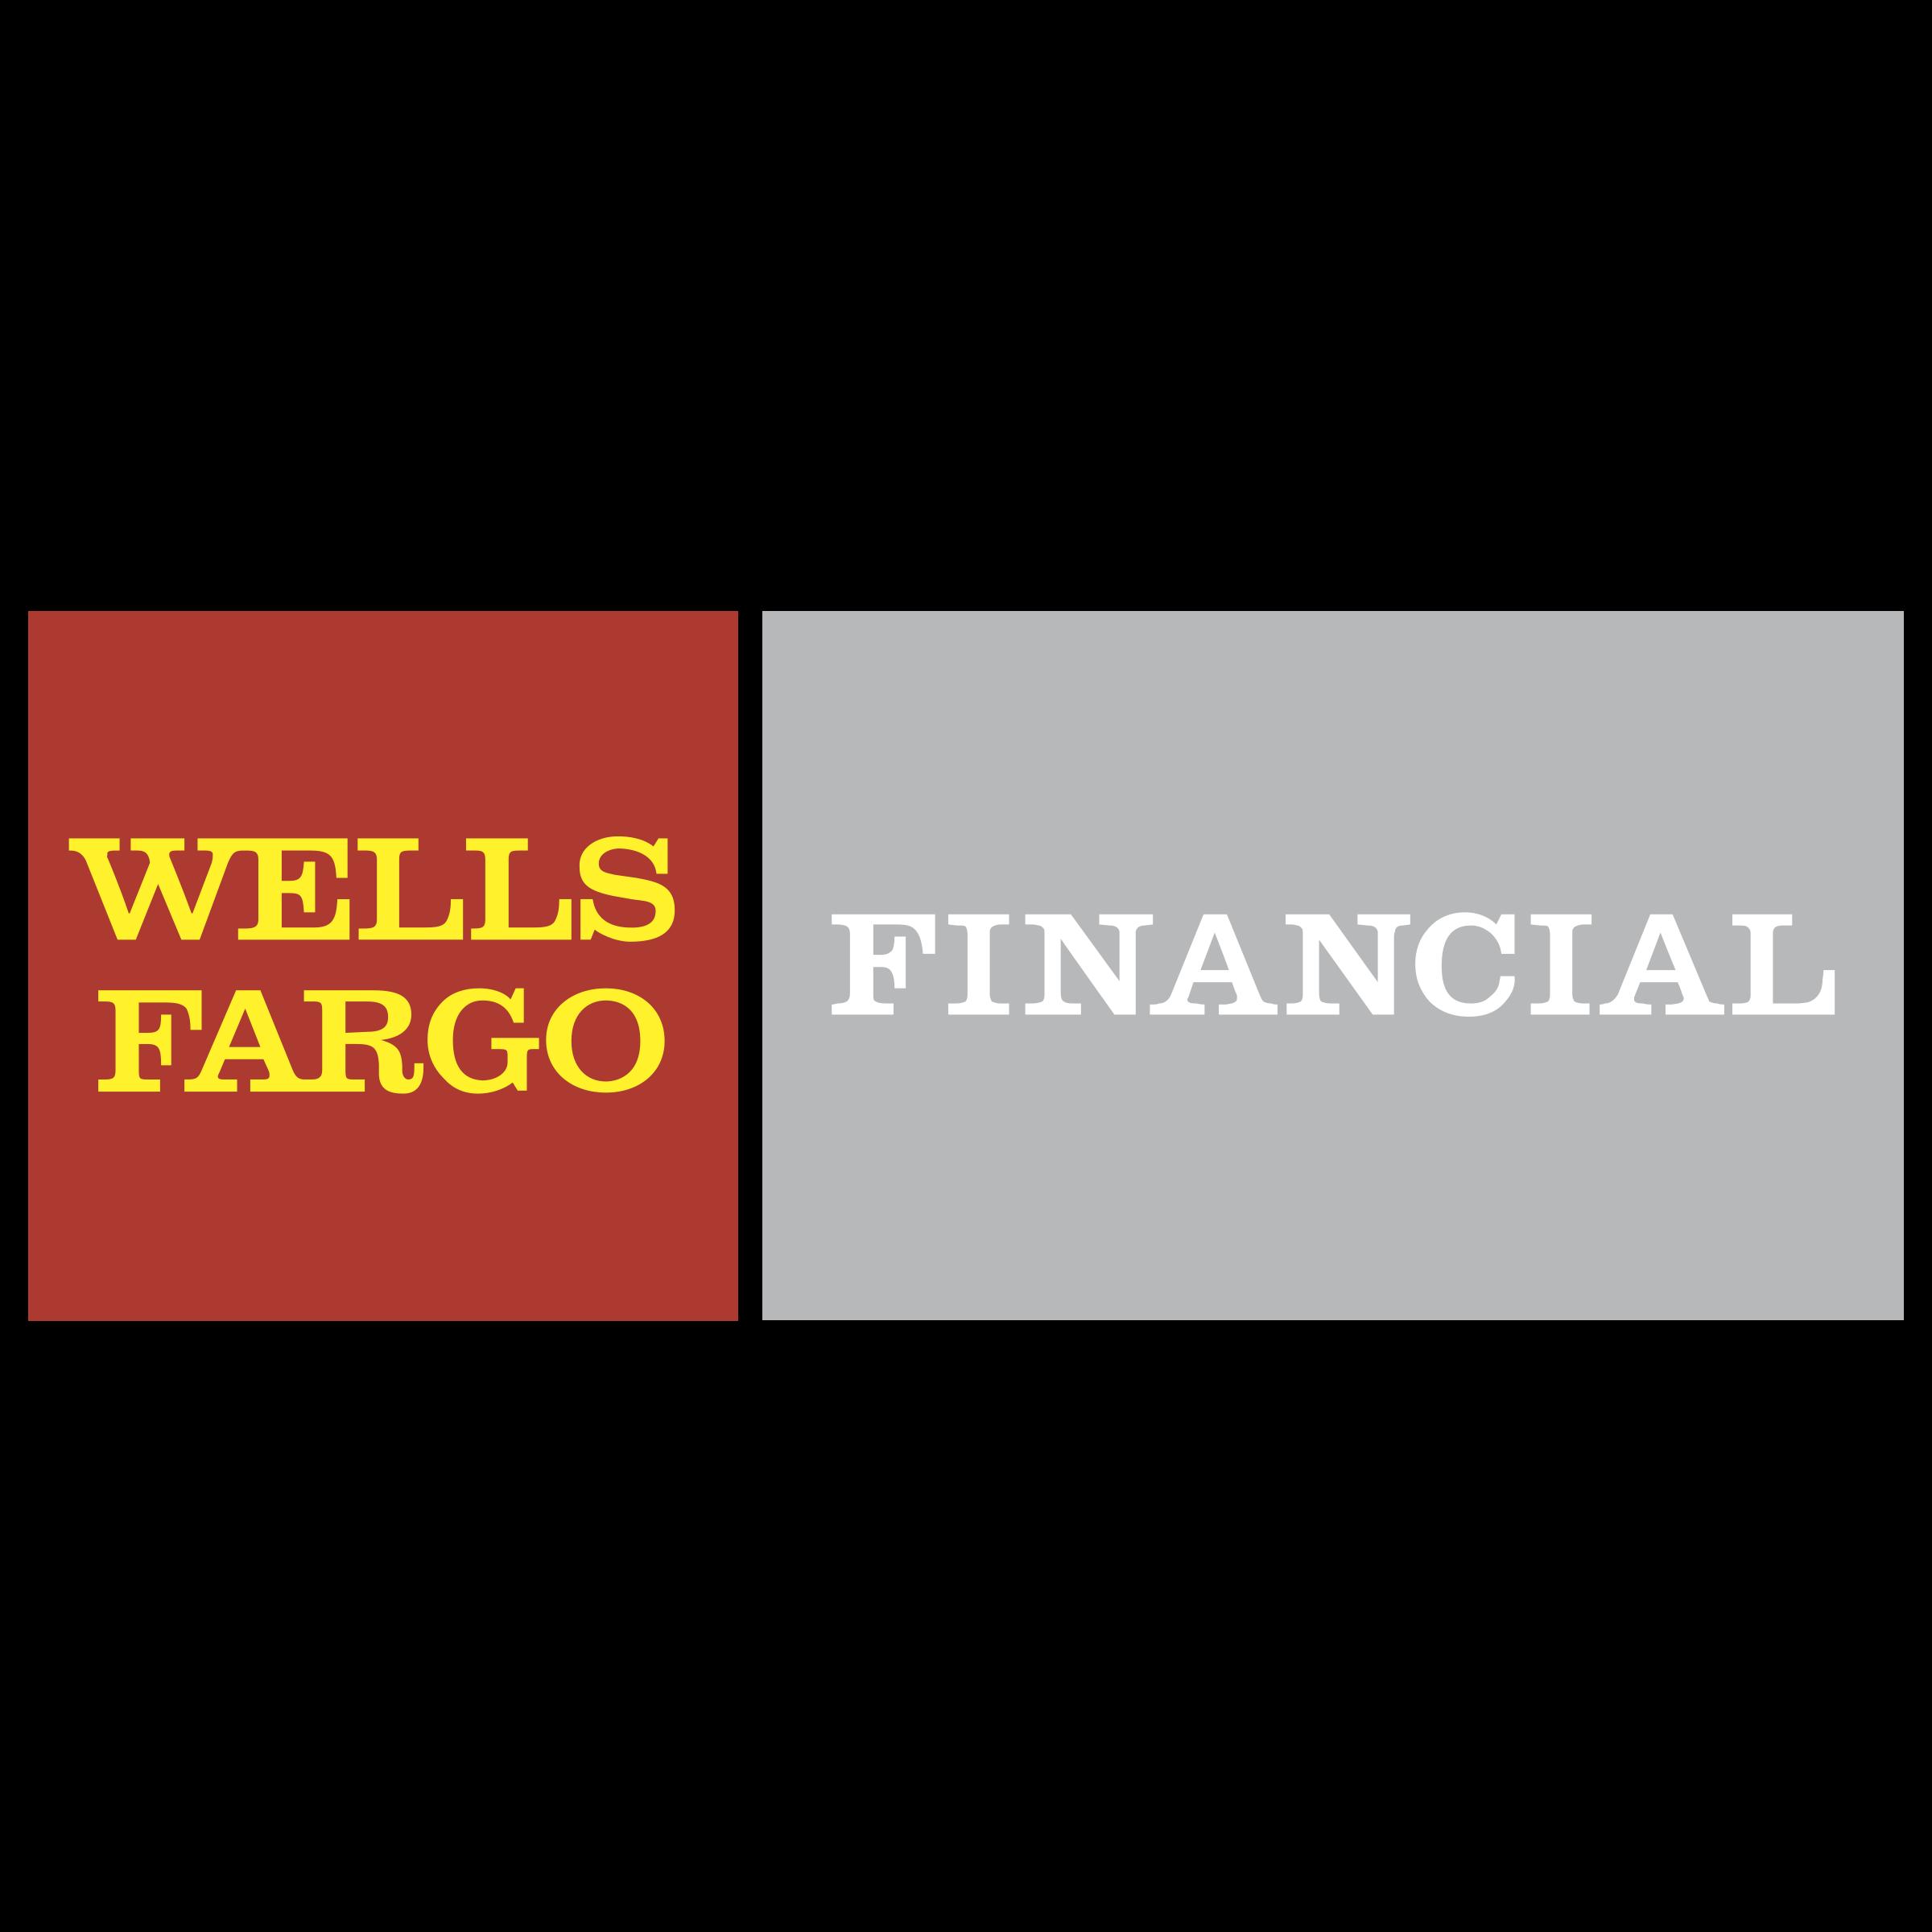 Wells Fargo Financial Logo PNG Transparent & SVG Vector - Freebie ...